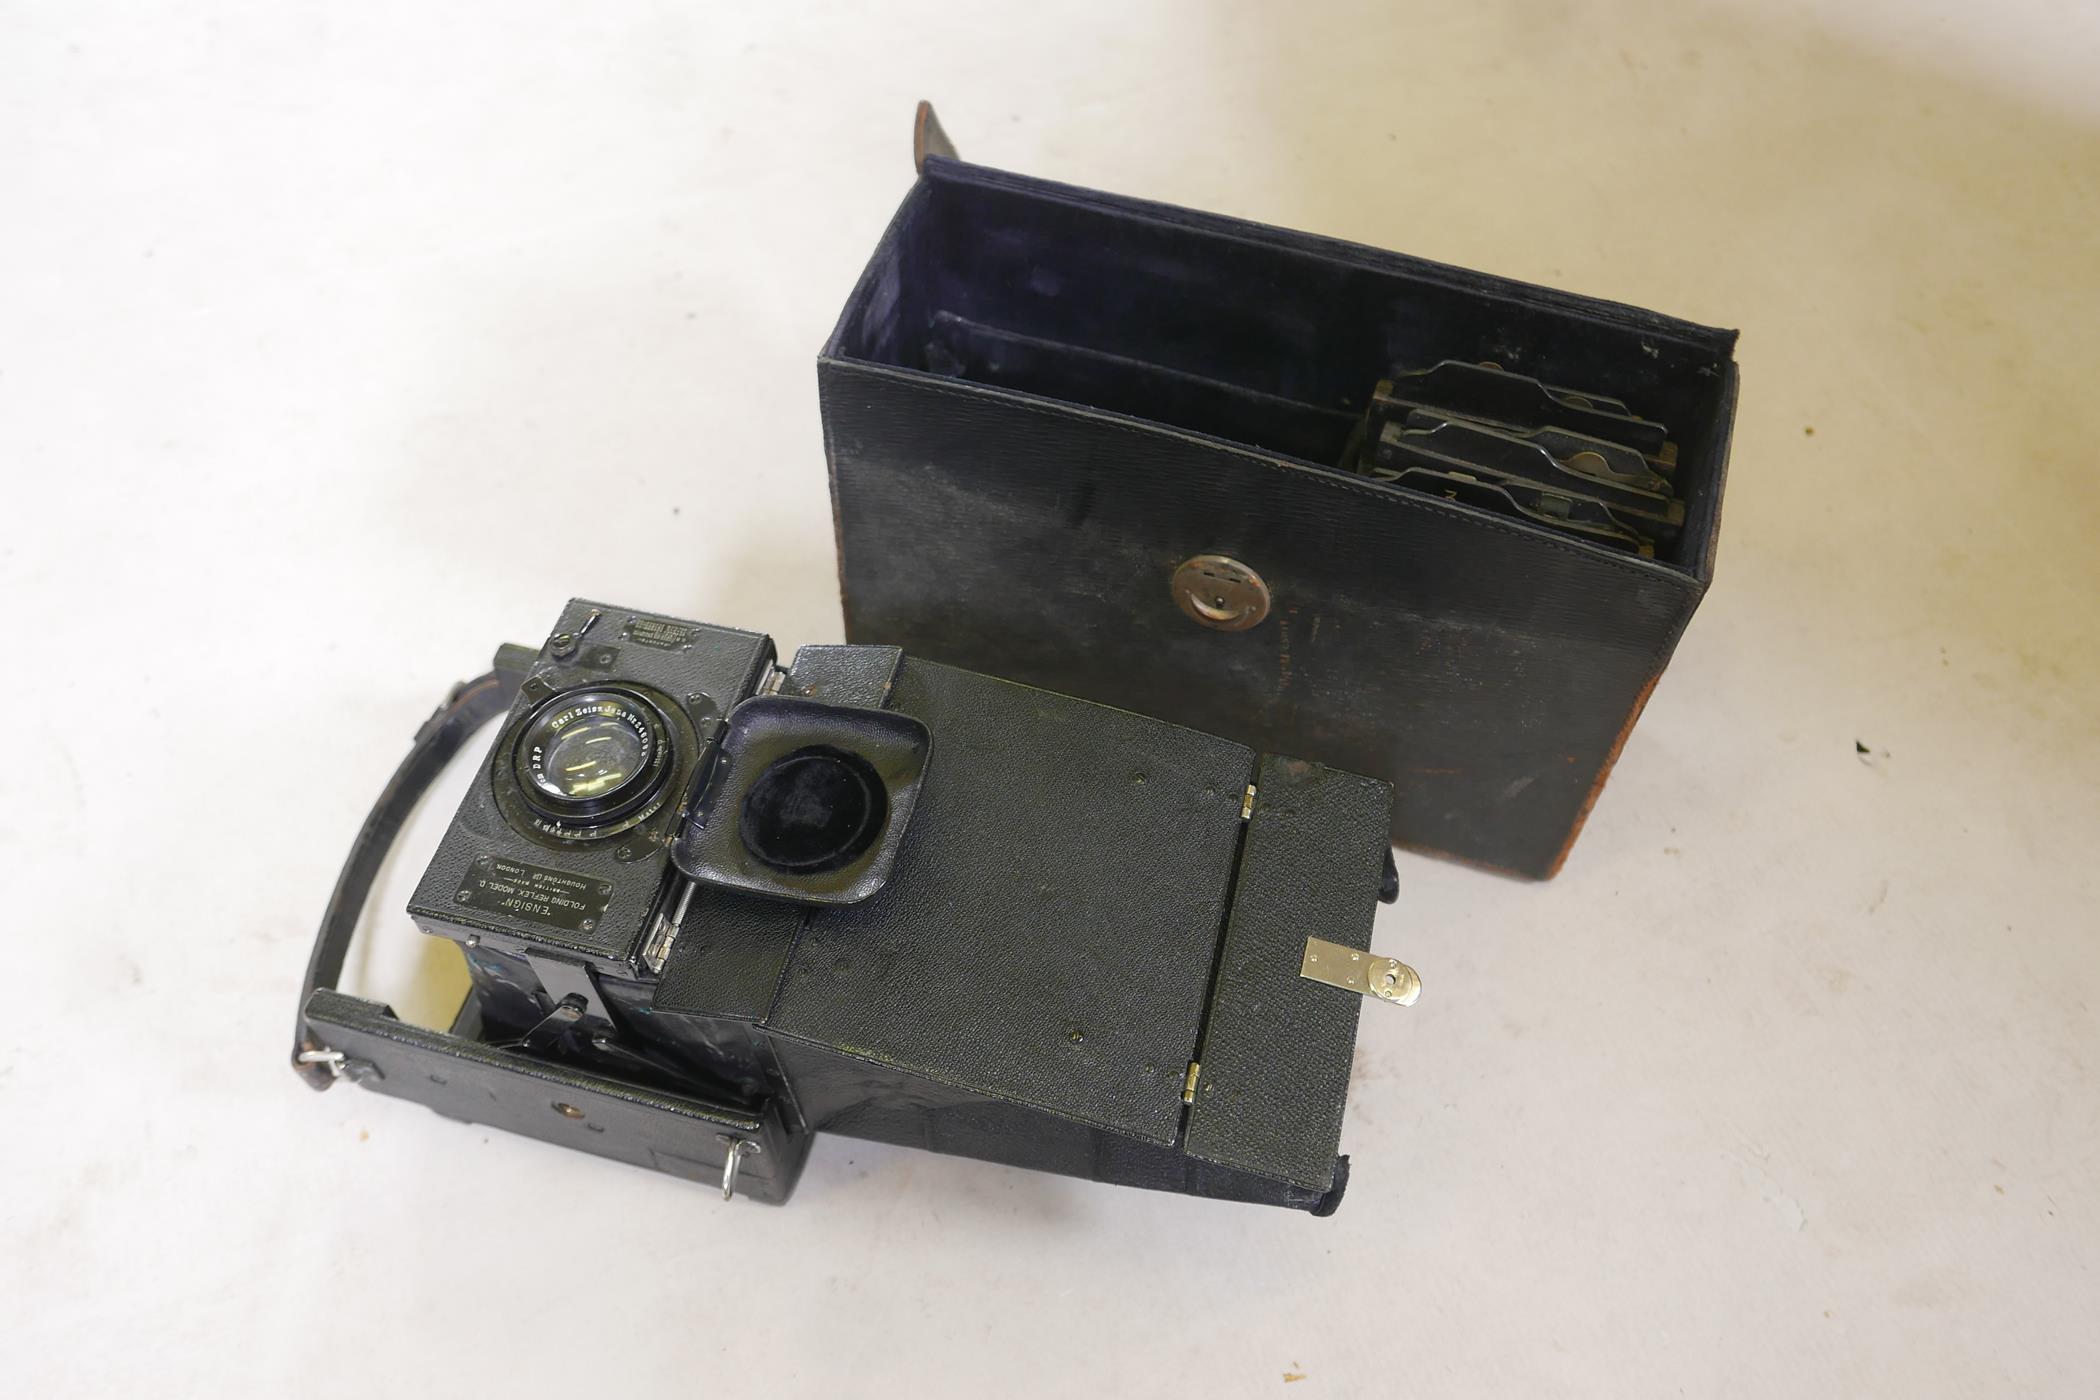 A quantity of antique photography equipment, Engsign Klito, Kodak Duaflex, No2 Hawkeye Model B, - Image 8 of 12